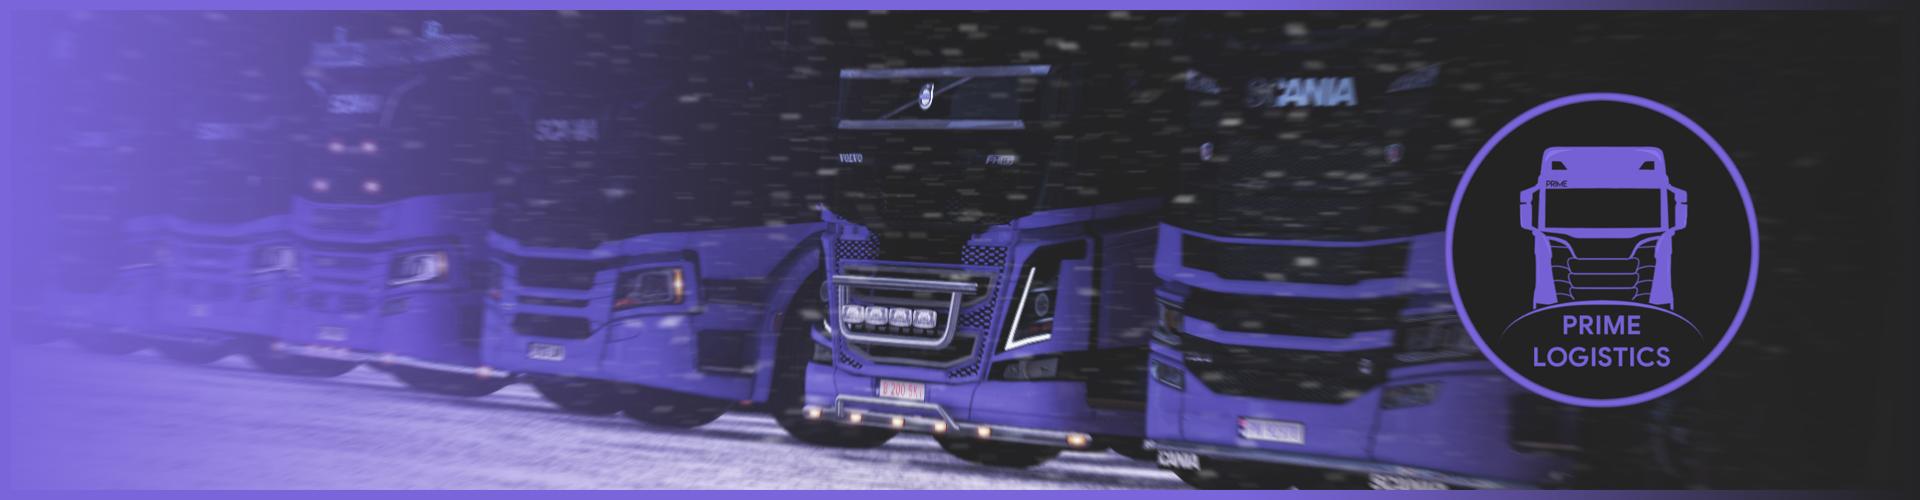 🟣 Prime Logistics Convoy #98